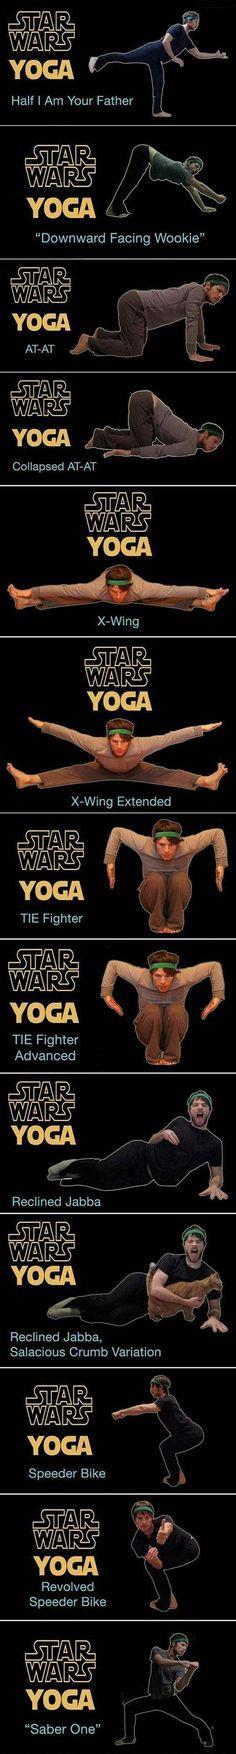 Star Wars Yoga Is Best Yoga